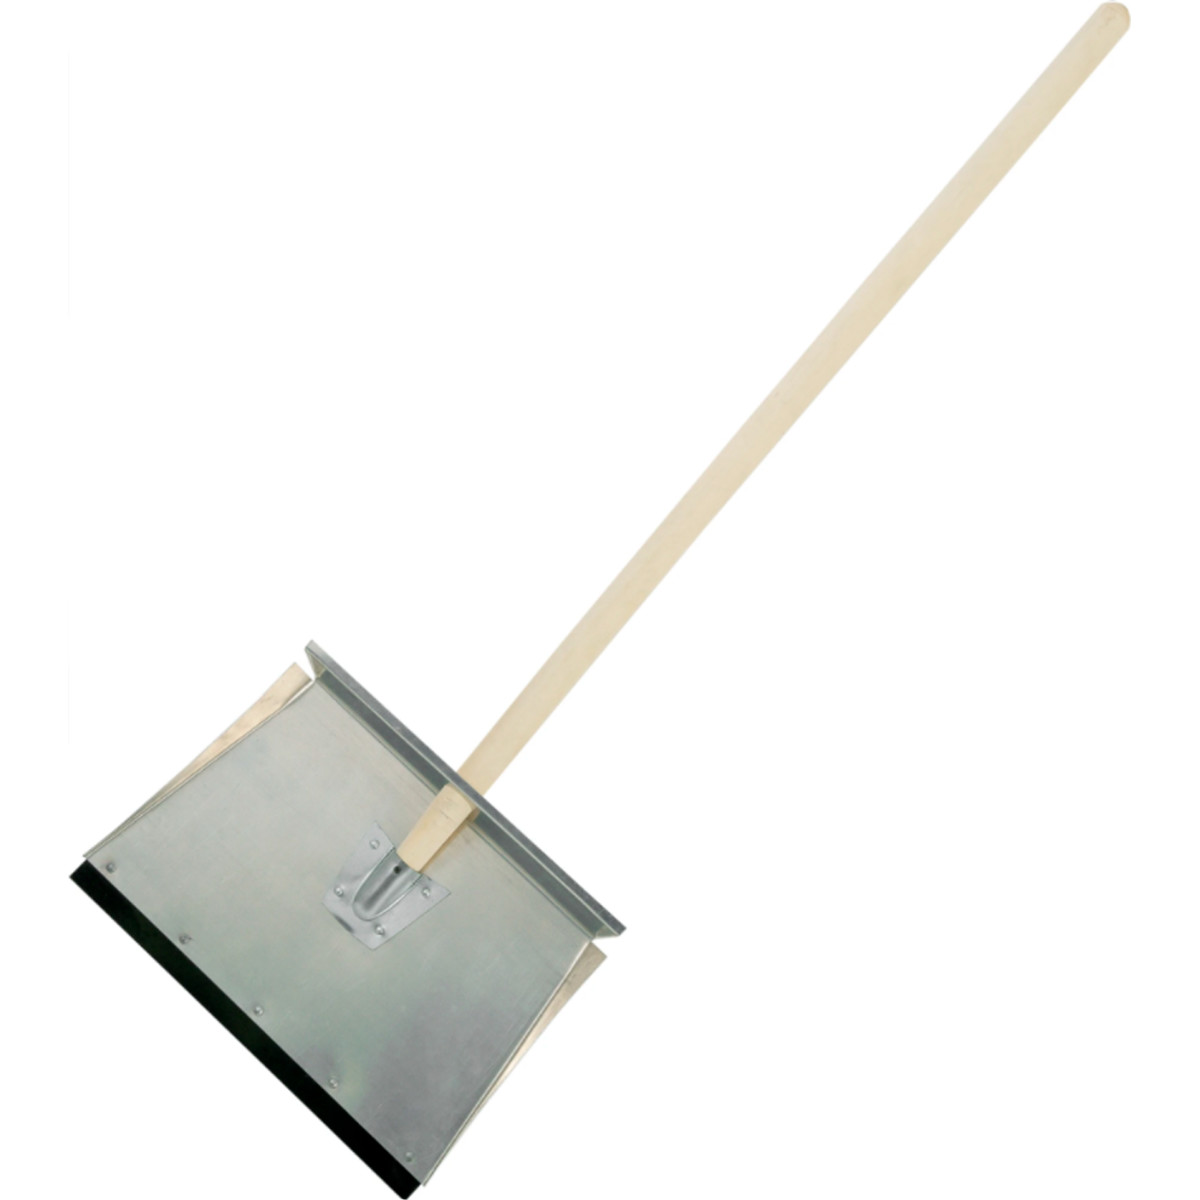 Лопата снеговая трехбортная Метал Про